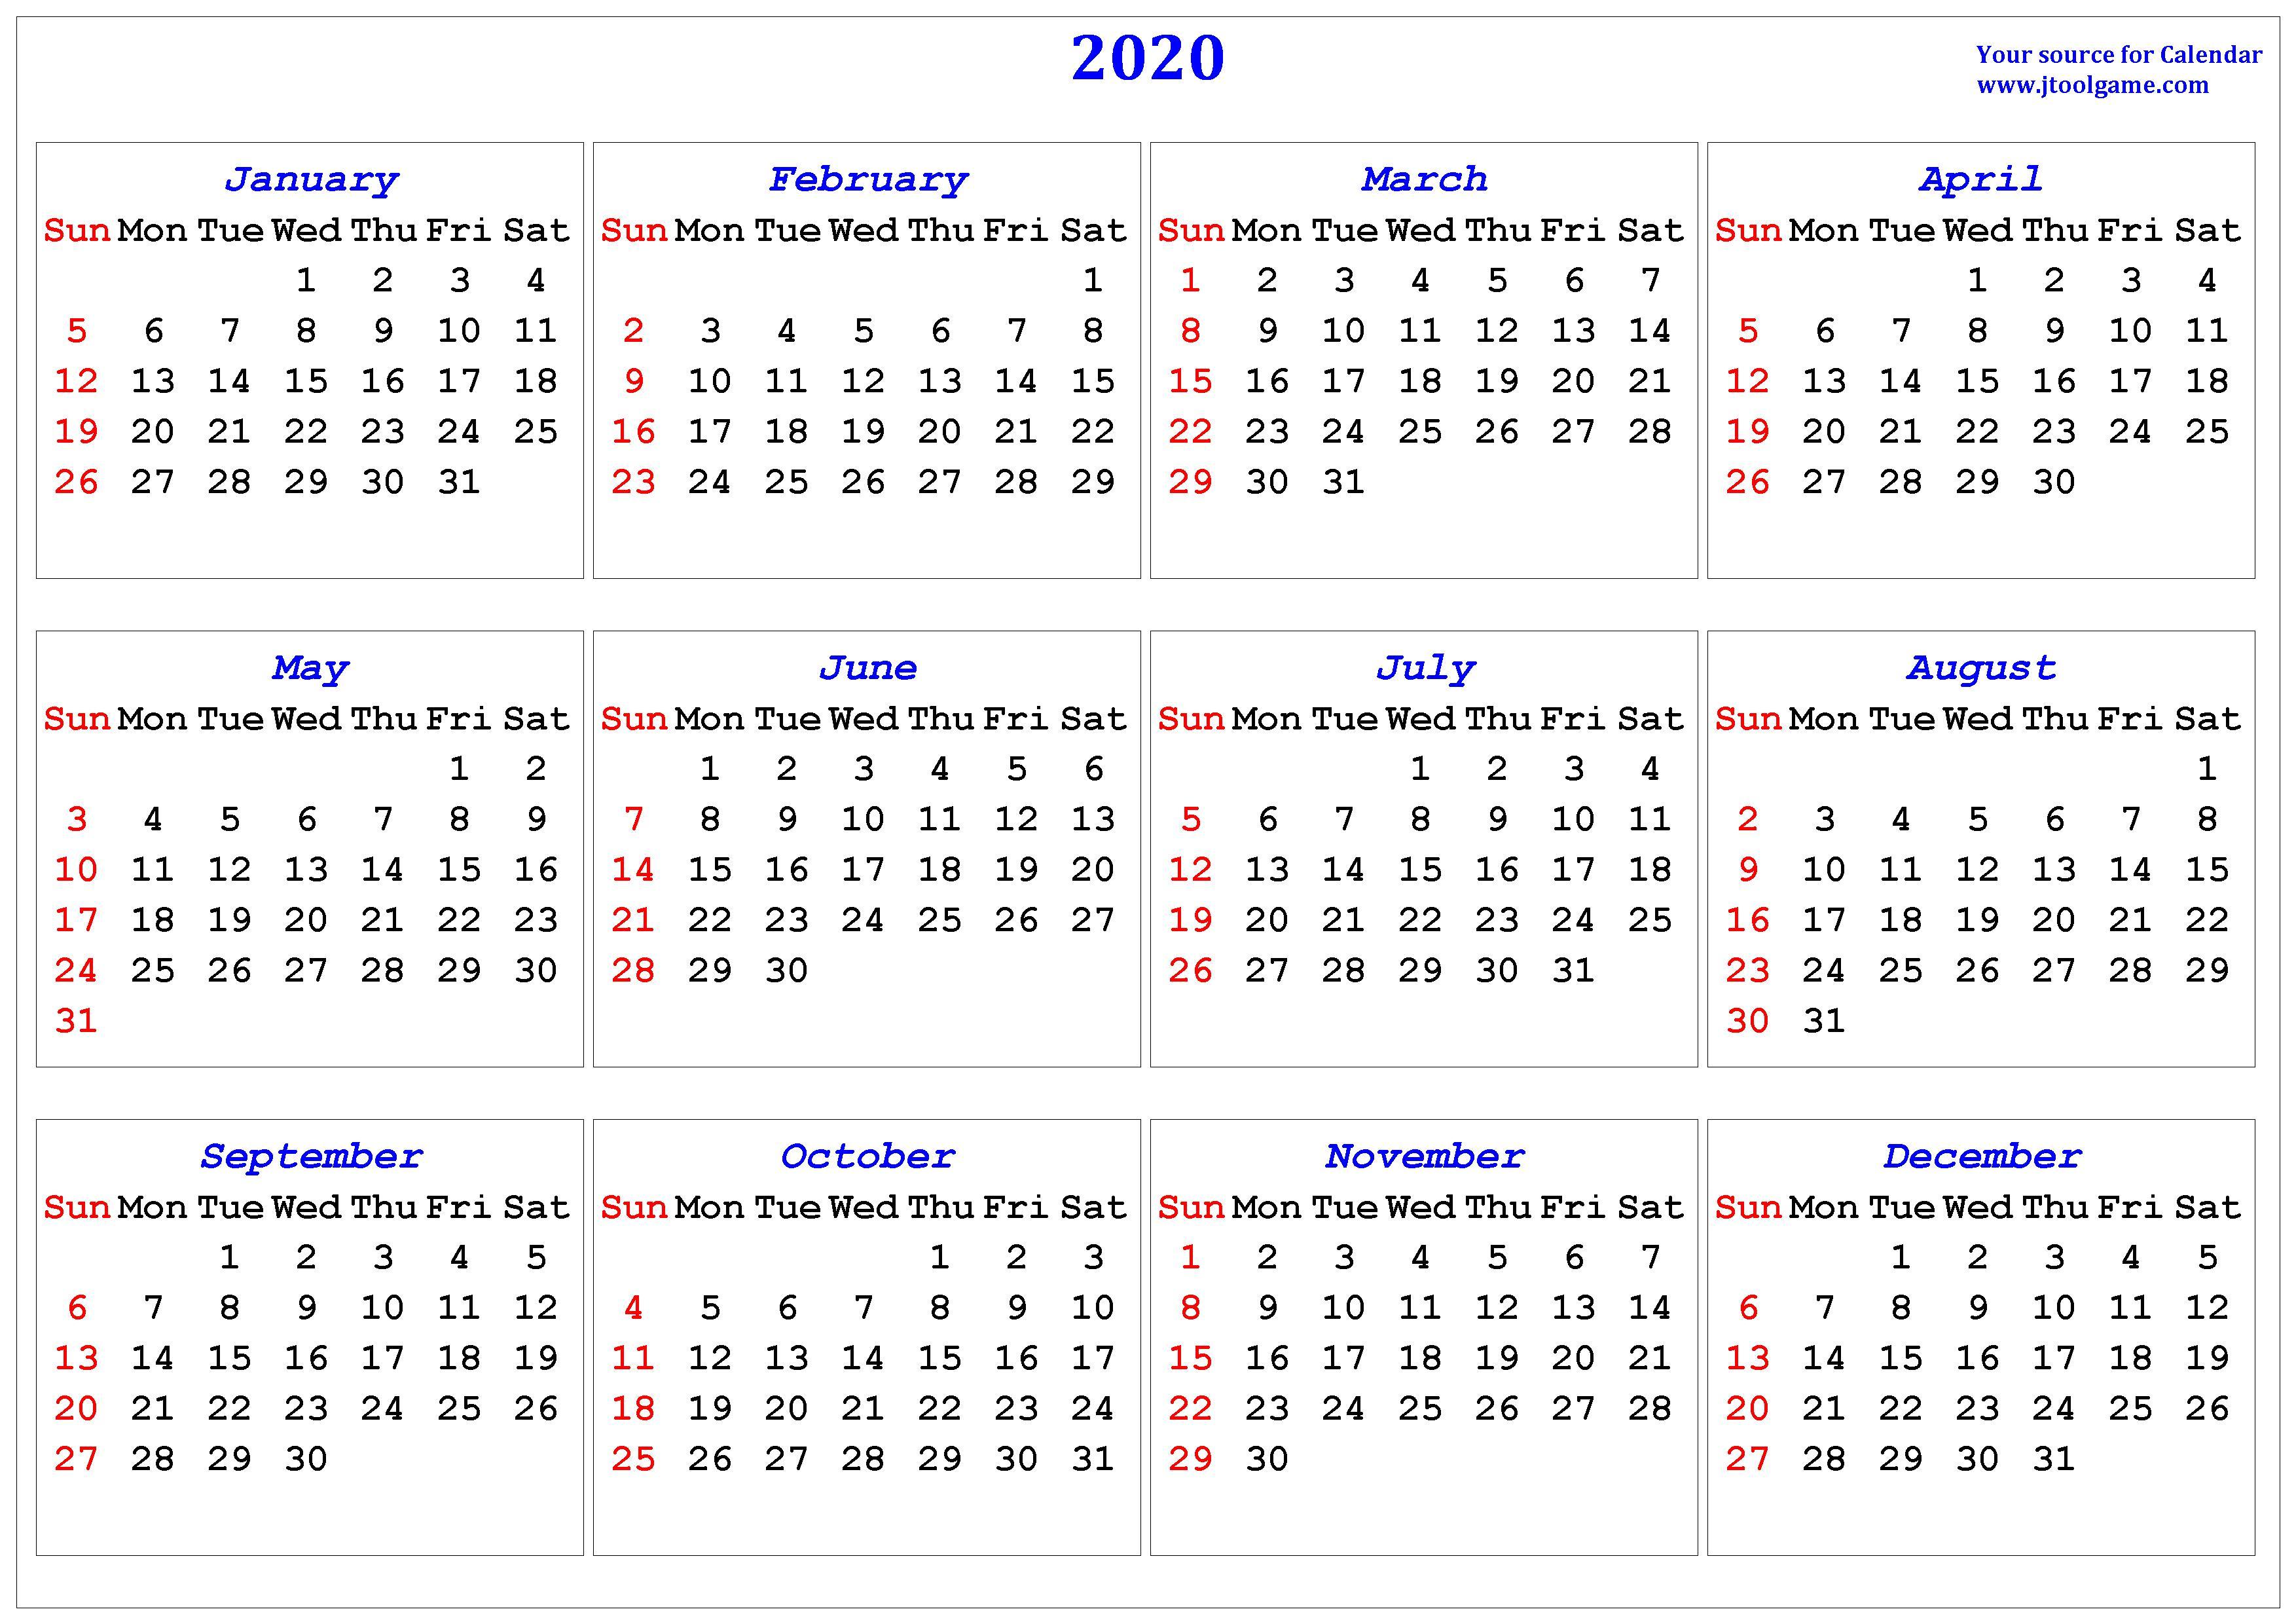 2020 Calendar - Printable Calendar. 2020 Calendar In Multiple Colors